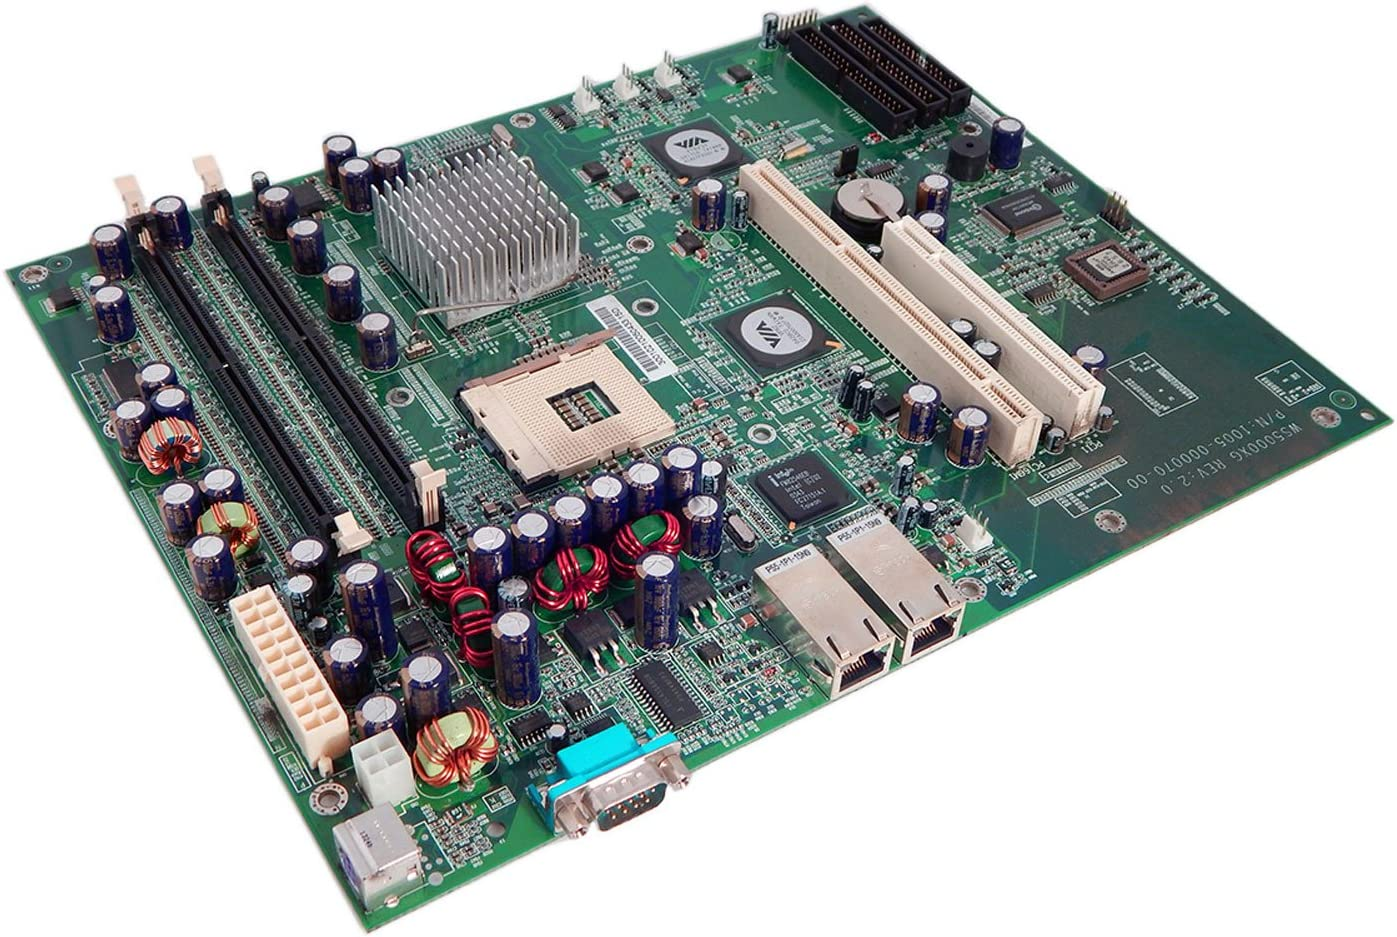 Symbol WS-5100-WW MPGA78b Motherboard 1005-000070-00 WS5000XG Rev 2.0